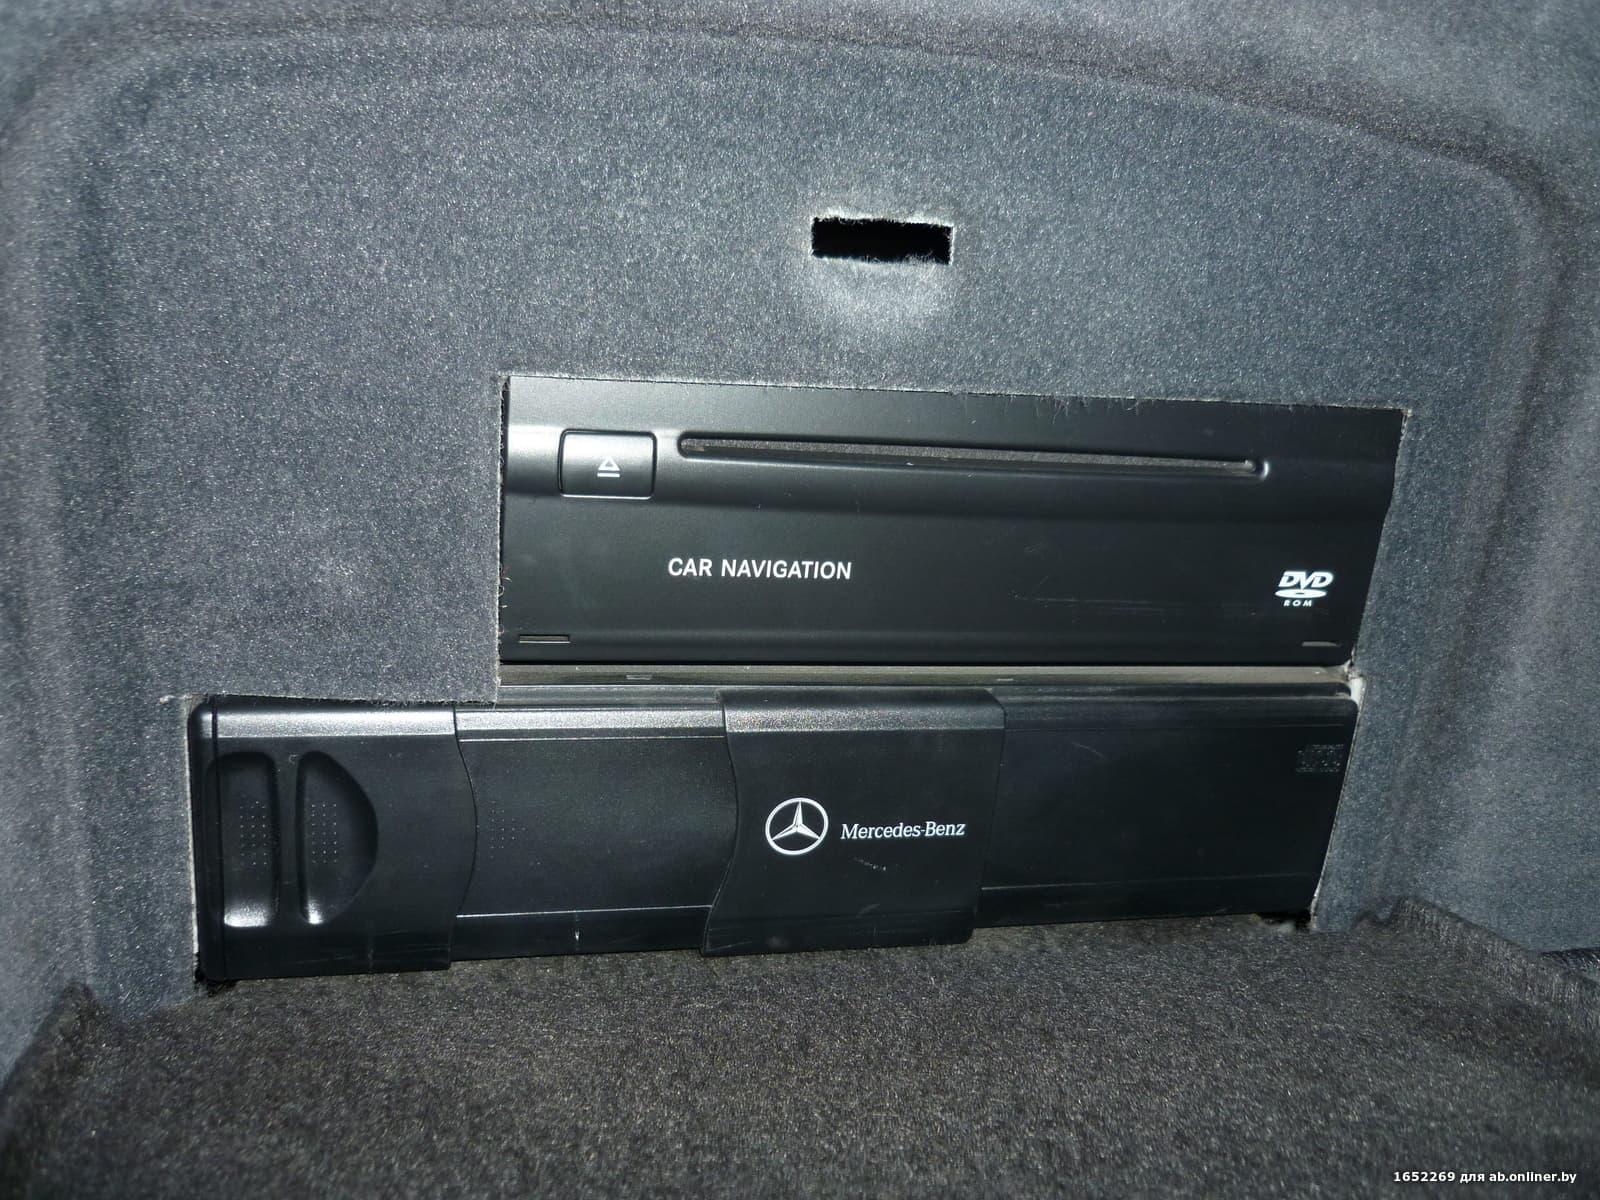 Mercedes-Benz S320 3.2 cdi restailing